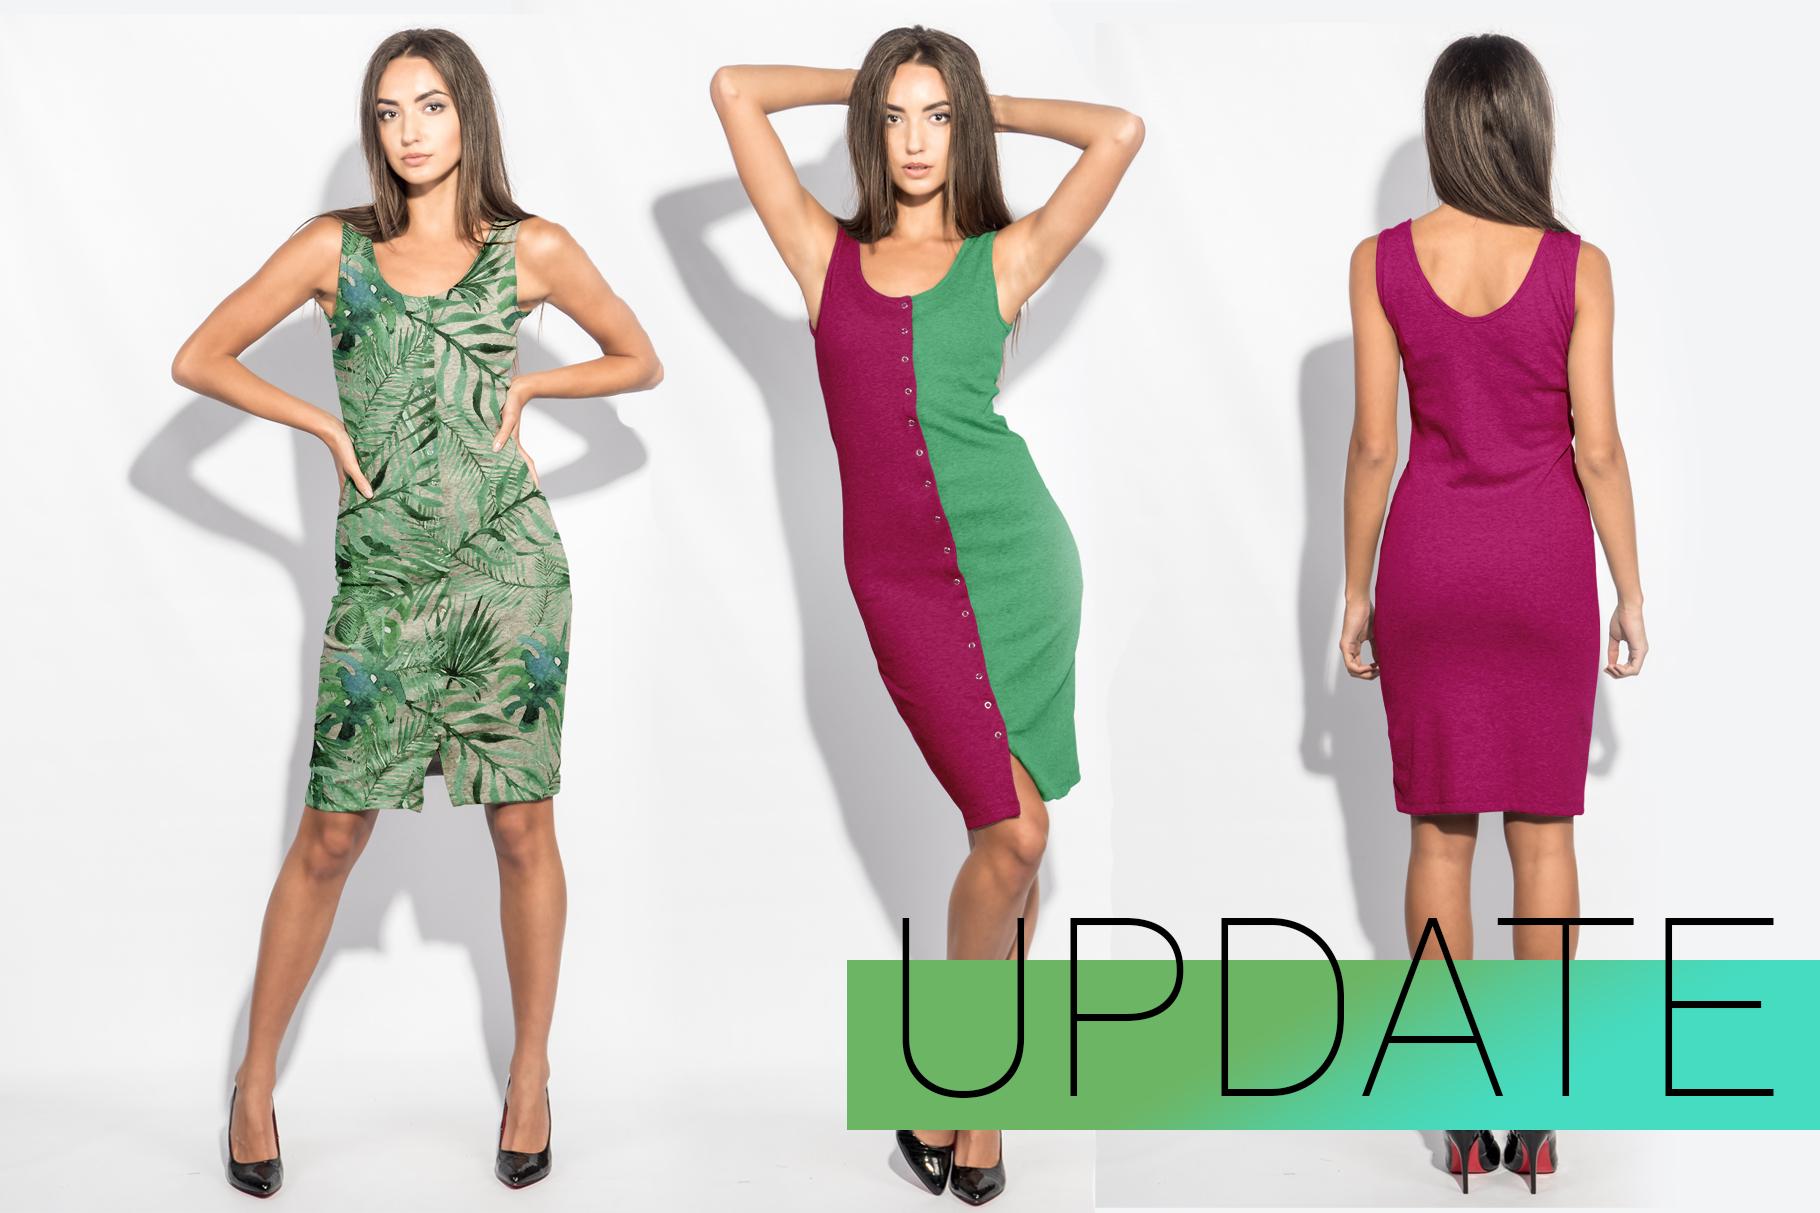 Woman's Dress Mockup Set example image 6